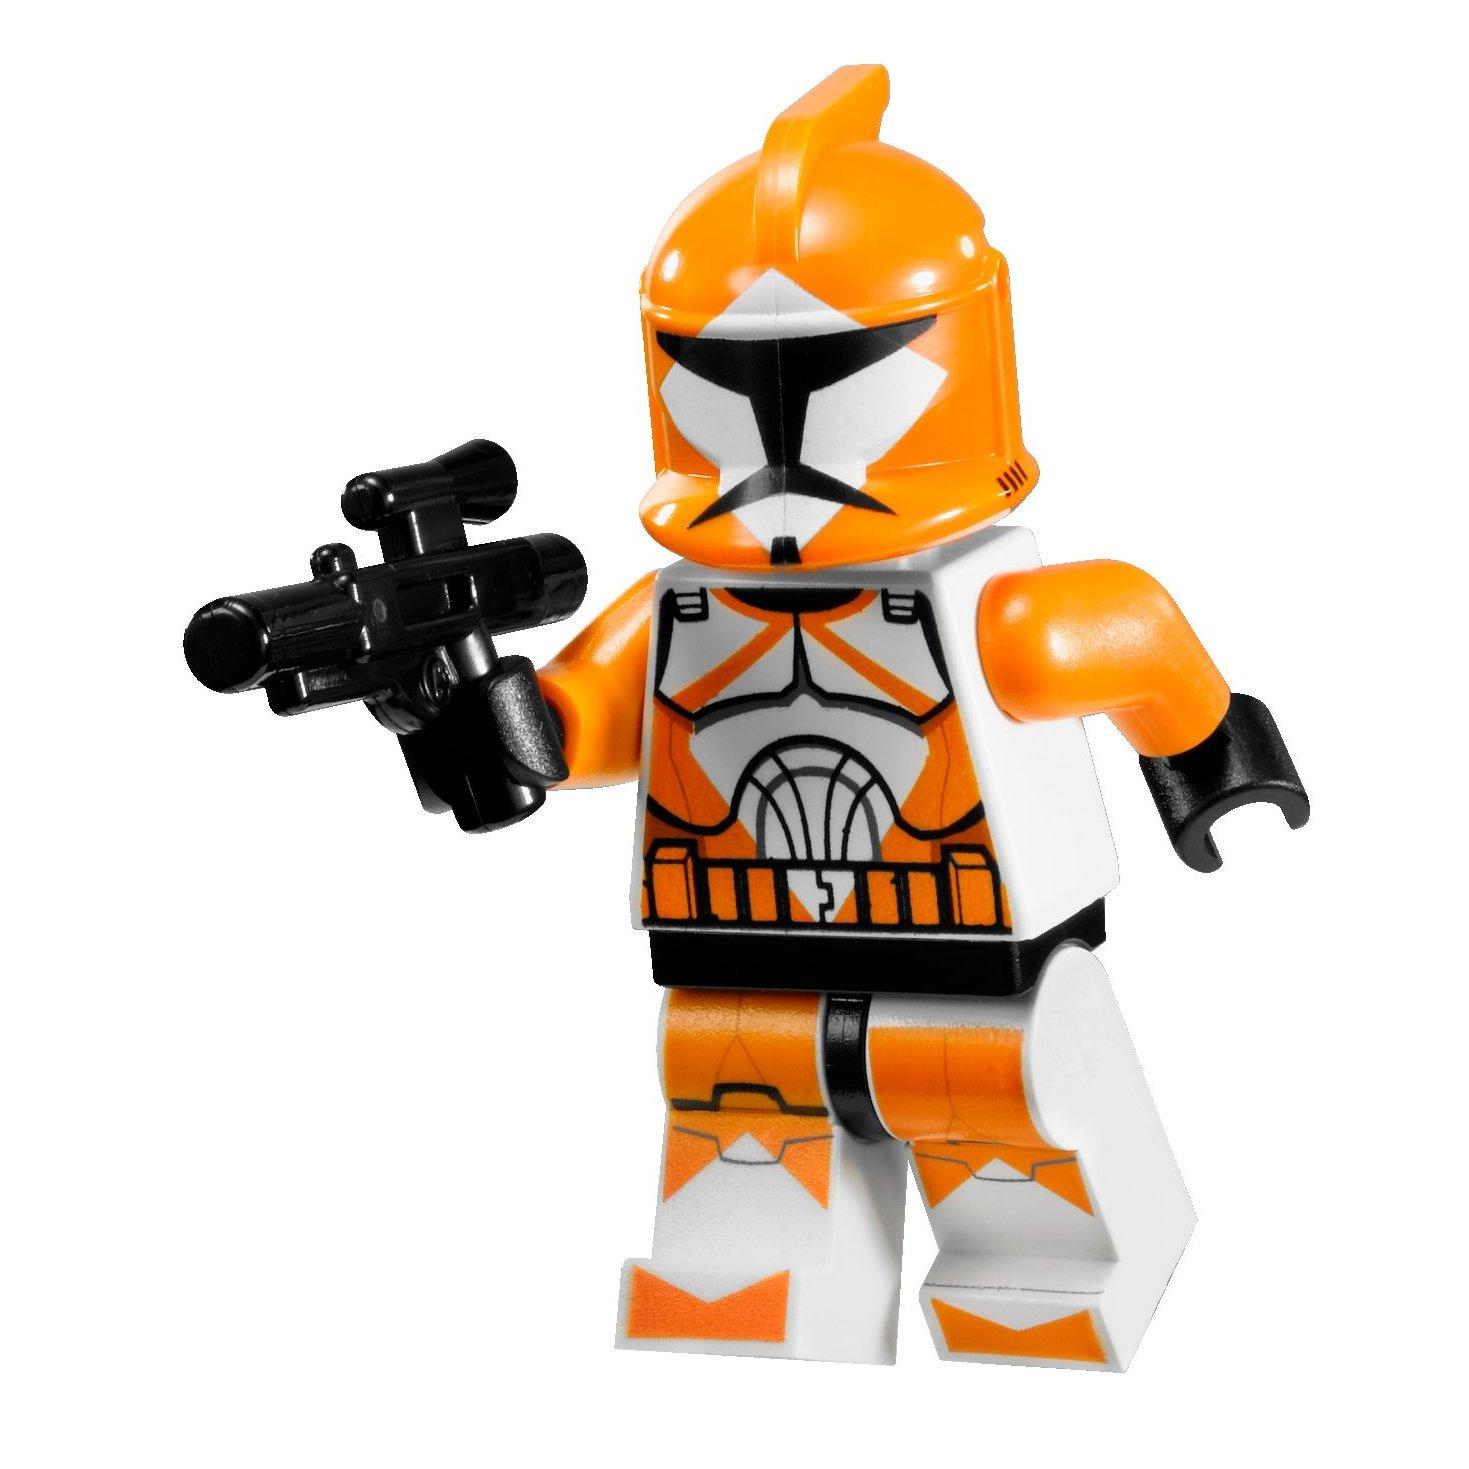 1469x1469 Lego Star Wars Clipart 2